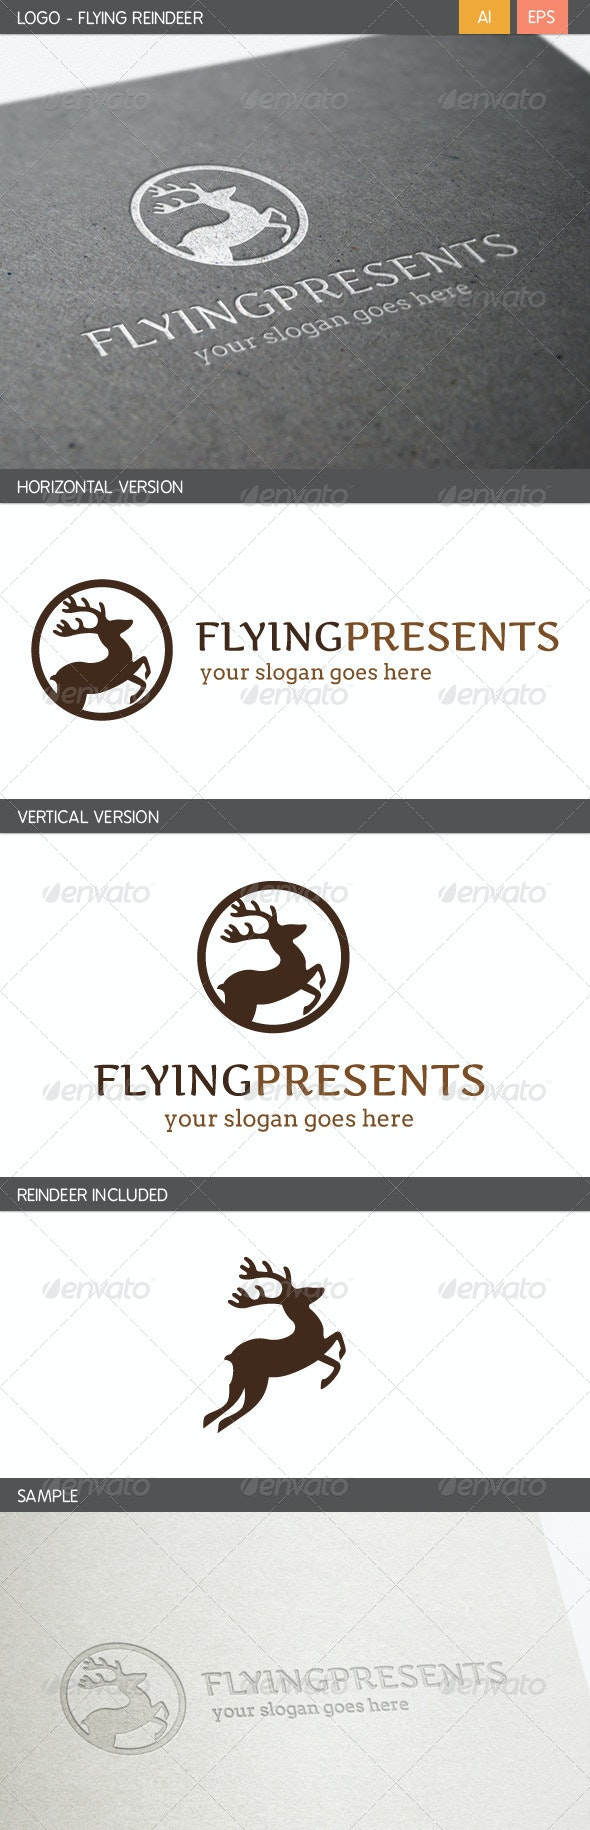 Flying Reindeer Logo - Animals Logo Templates